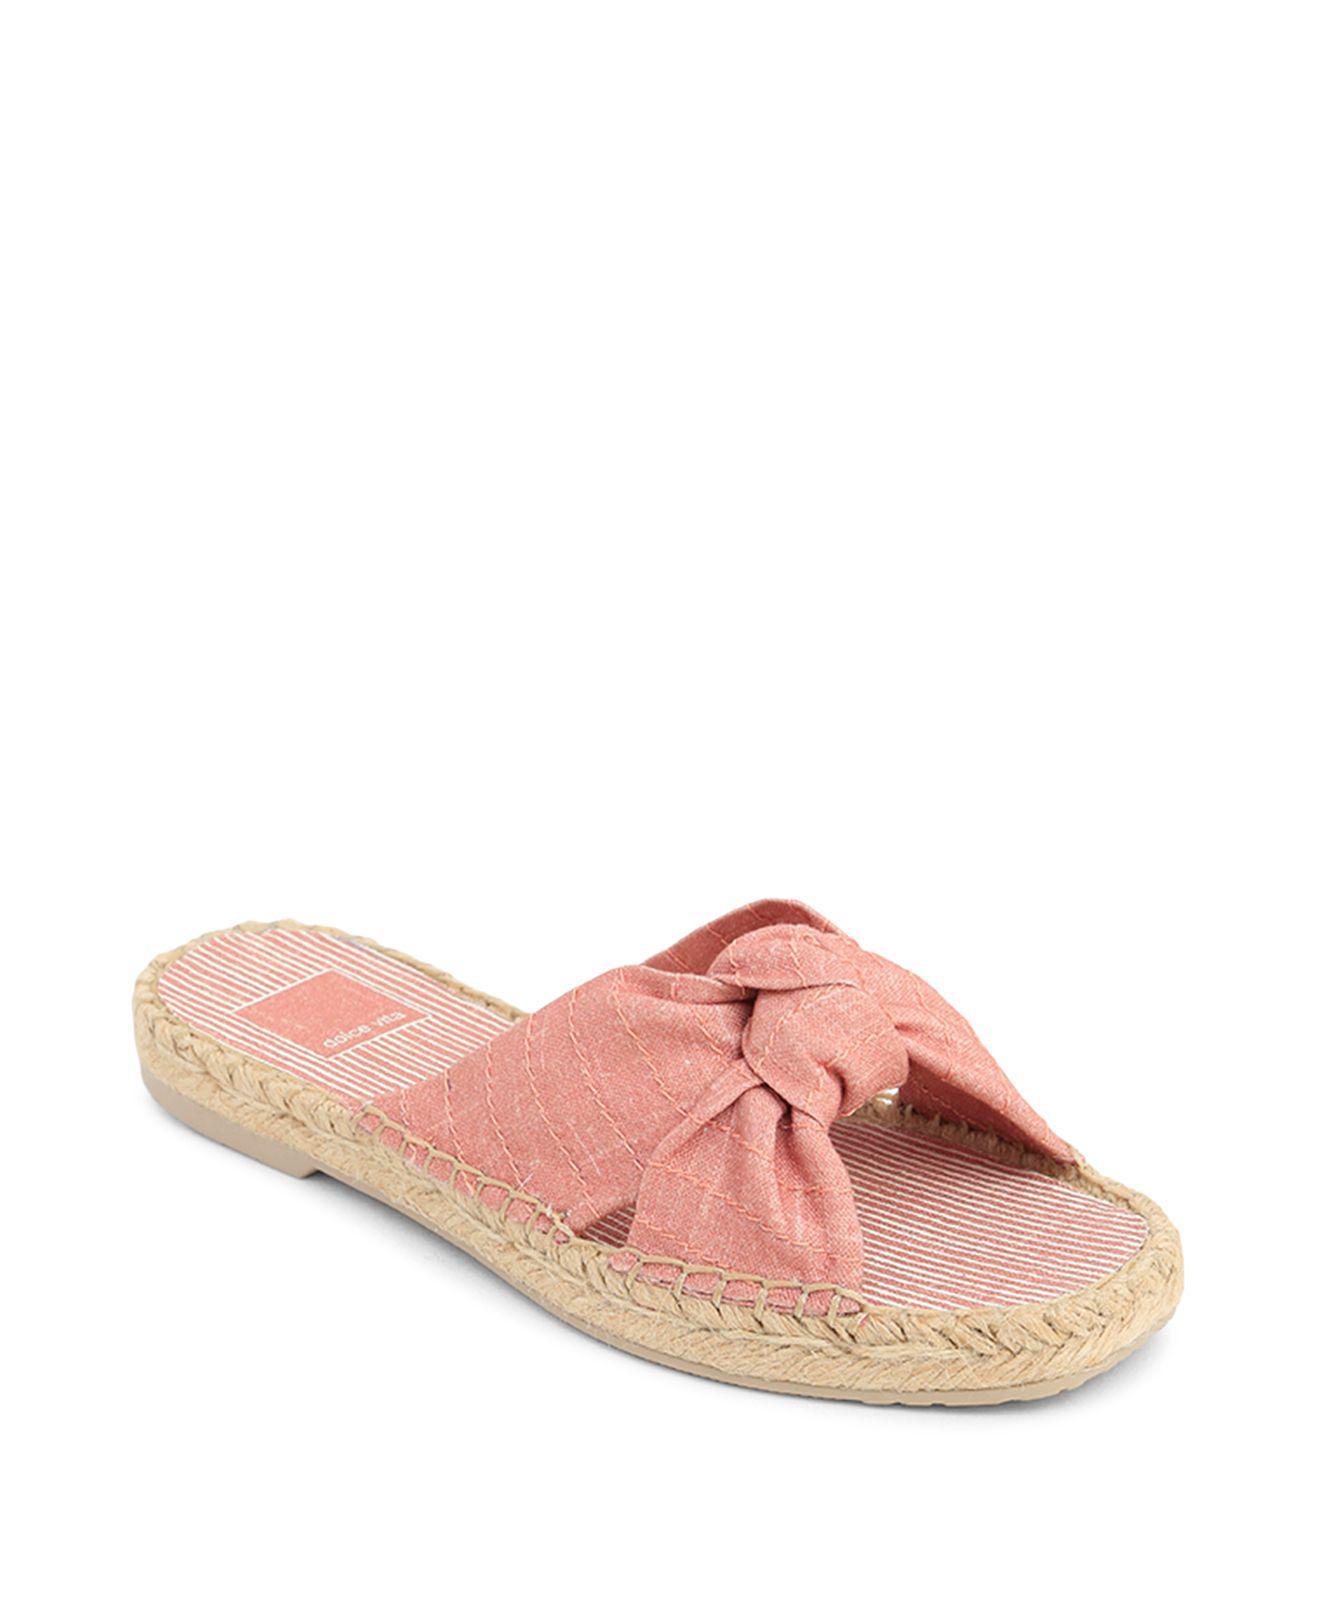 Dolce Vita Women's Single Knot Espadrille Slide Sandals GKXe51a5